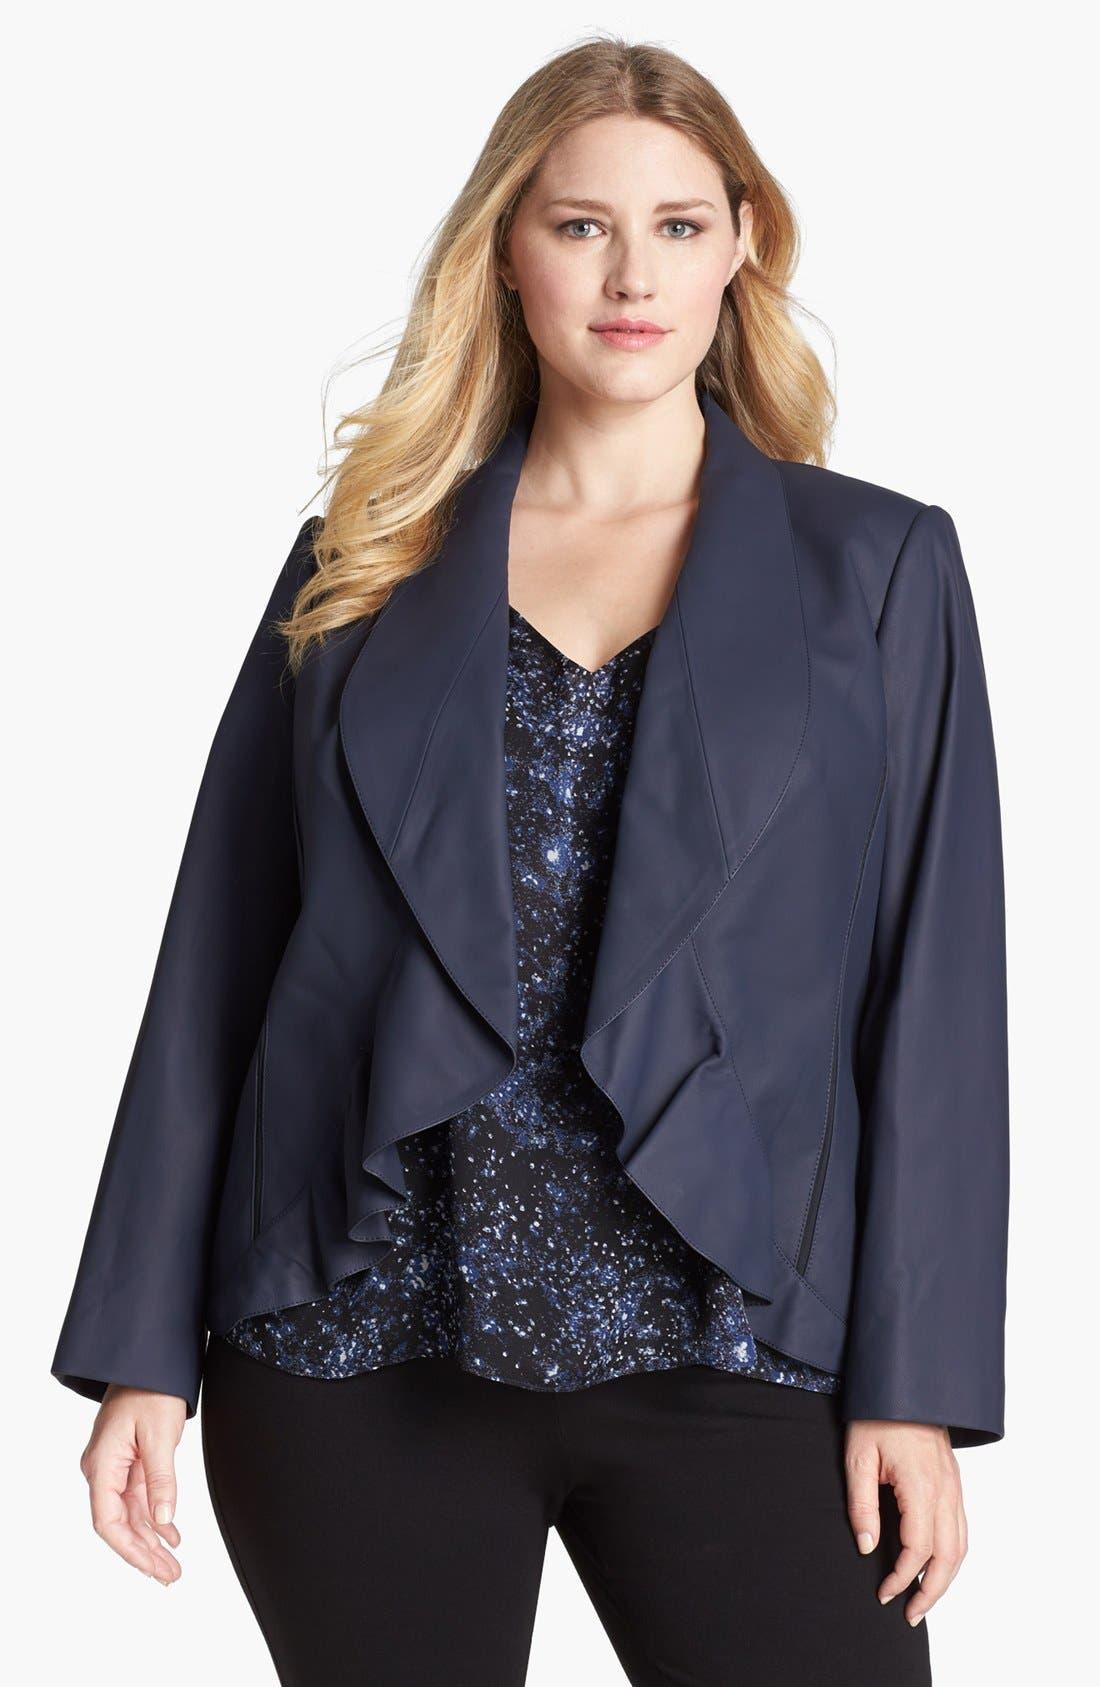 Alternate Image 1 Selected - Lafayette 148 New York 'Trula' Lambskin Leather Jacket (Plus Size)